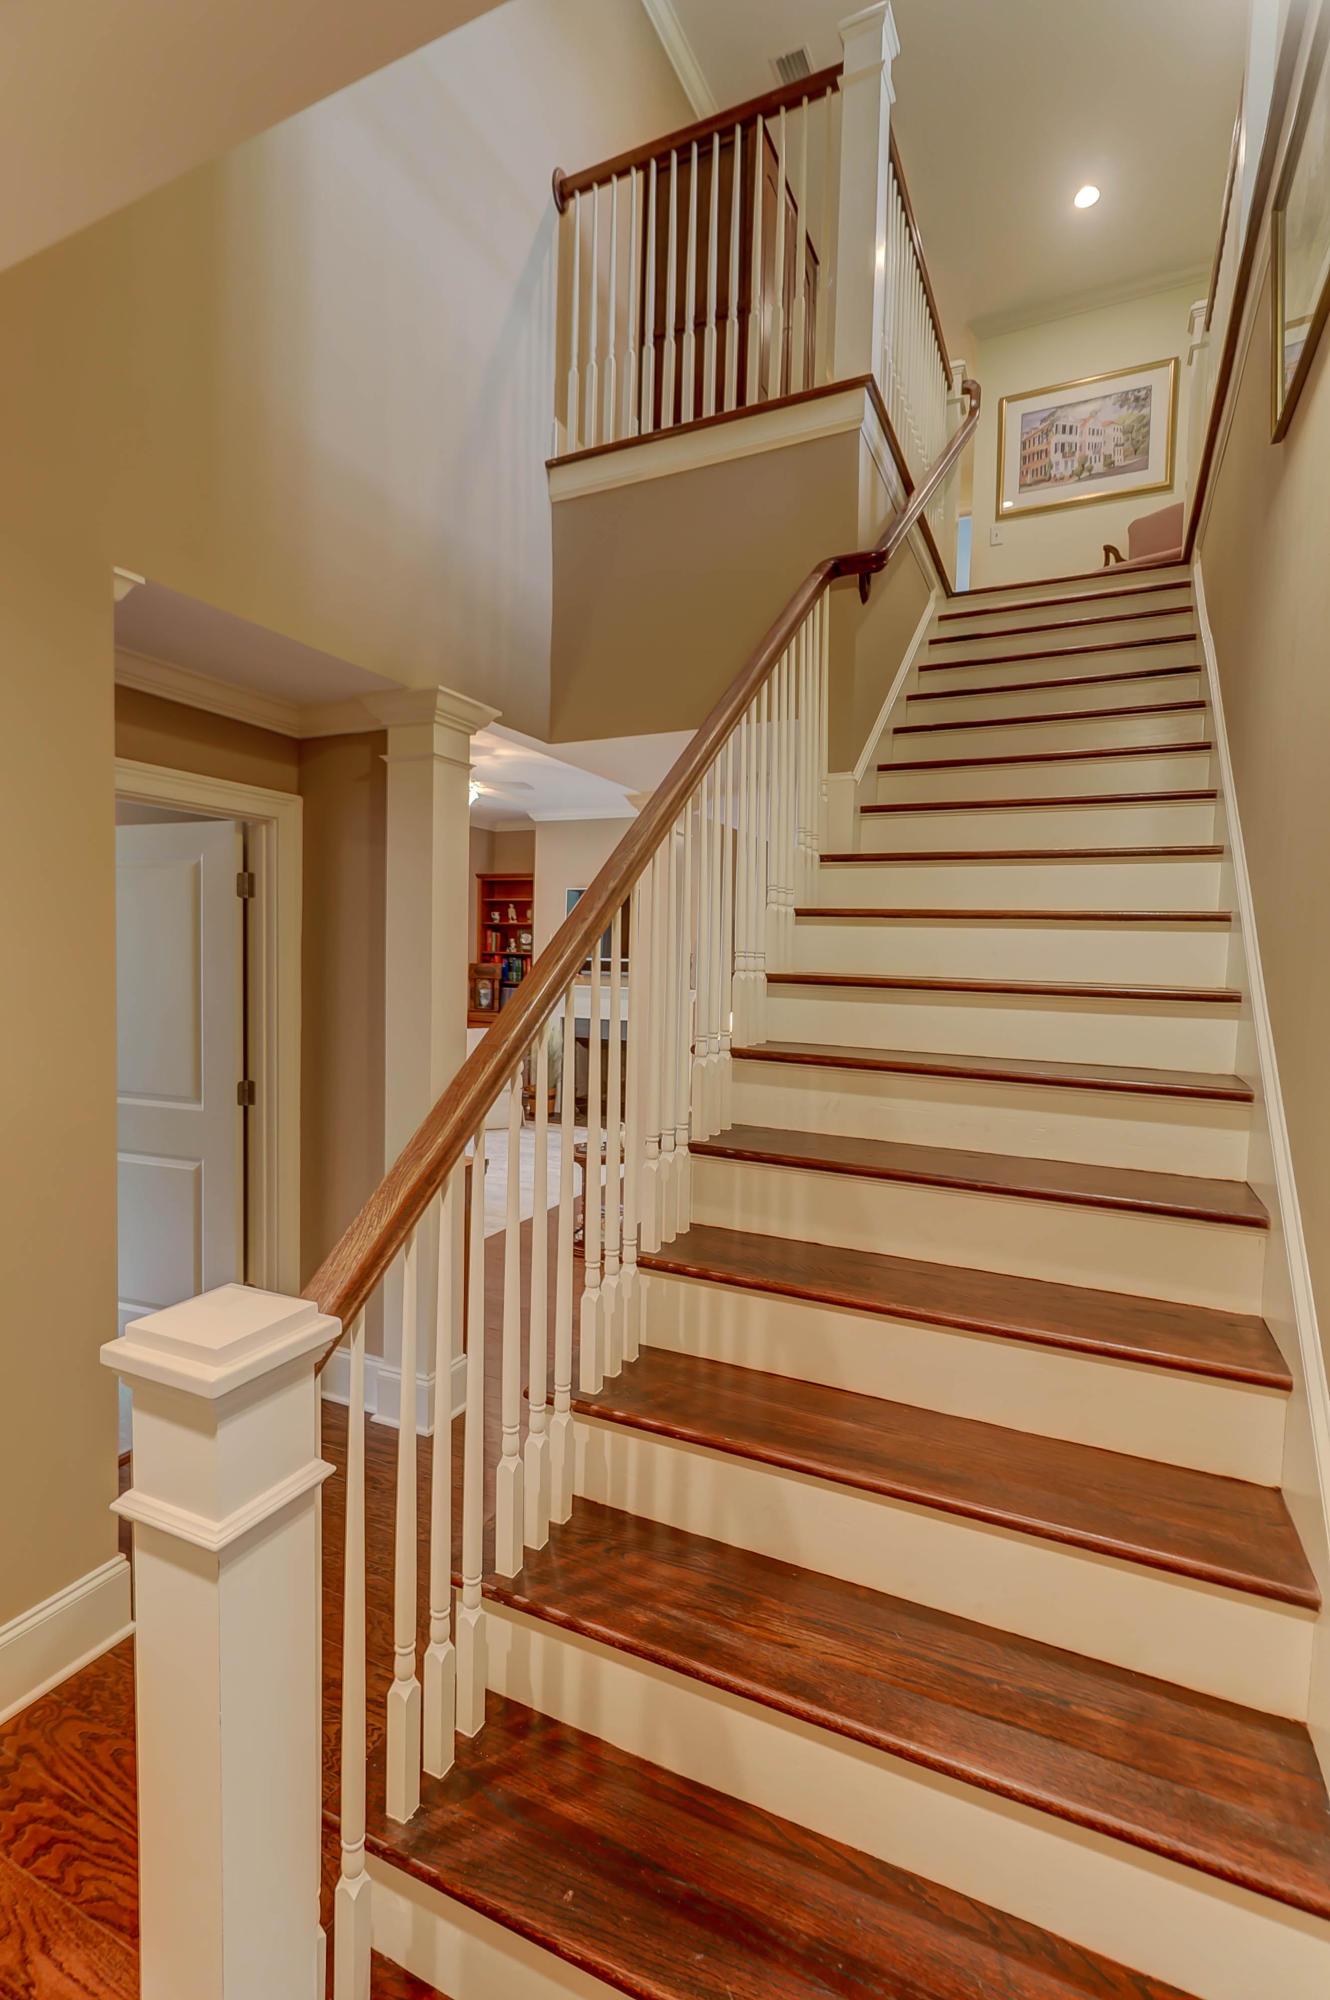 Park West Homes For Sale - 3082 Rice Field, Mount Pleasant, SC - 20